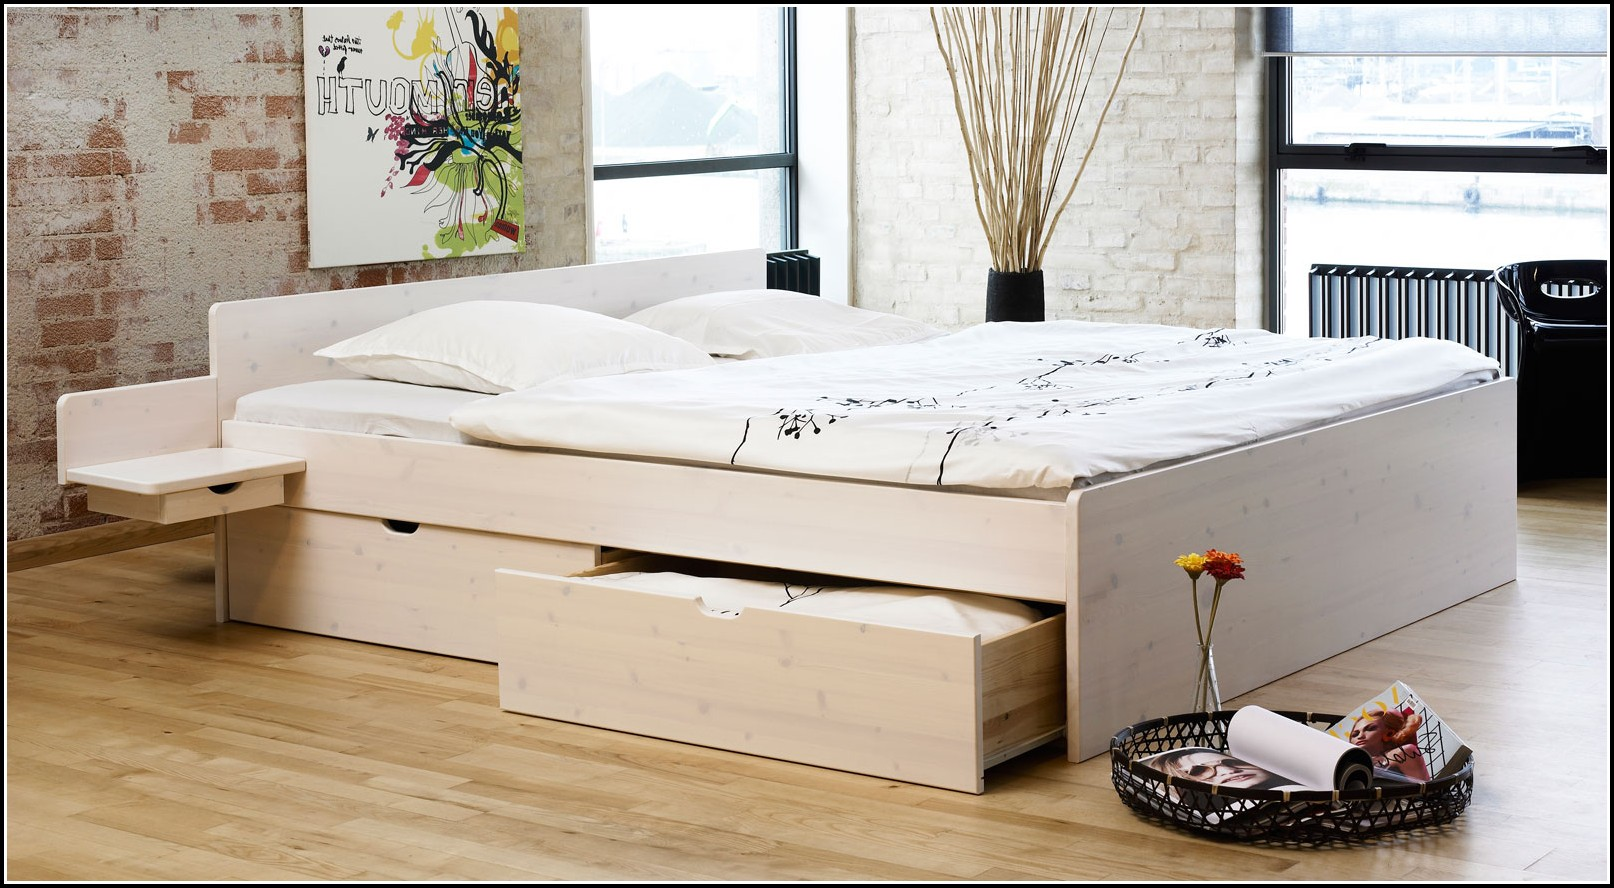 ikea bett weis holz betten house und dekor galerie. Black Bedroom Furniture Sets. Home Design Ideas